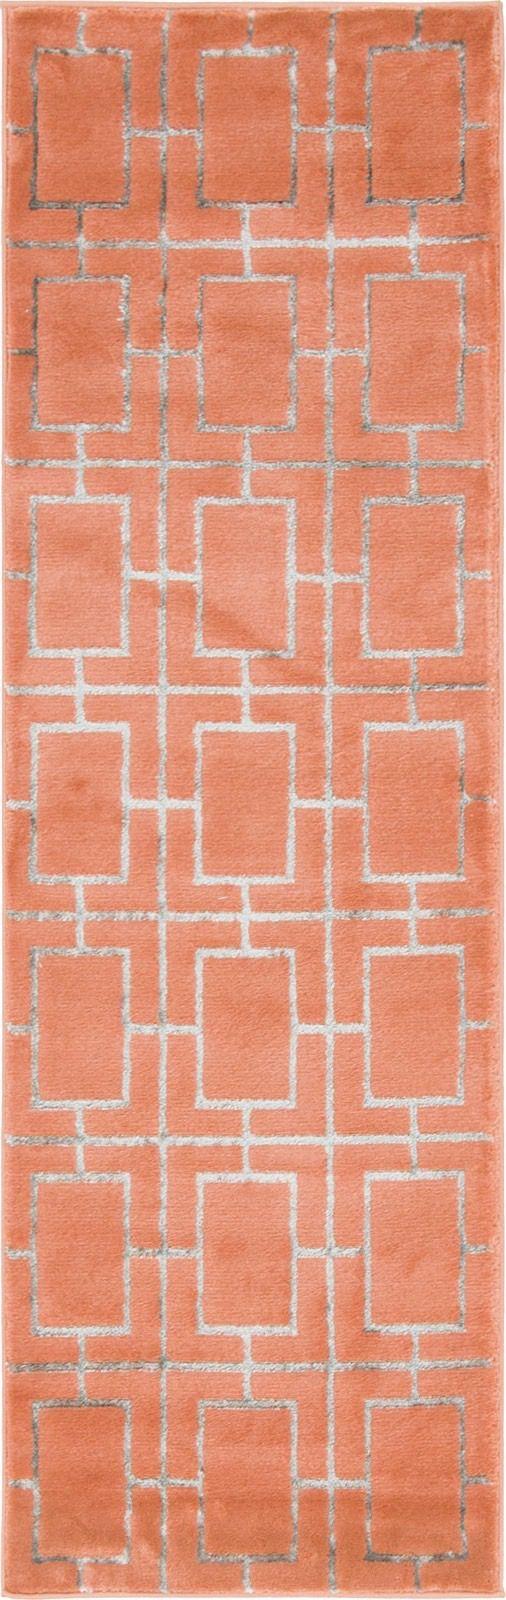 glitzy contemporary area rug collection